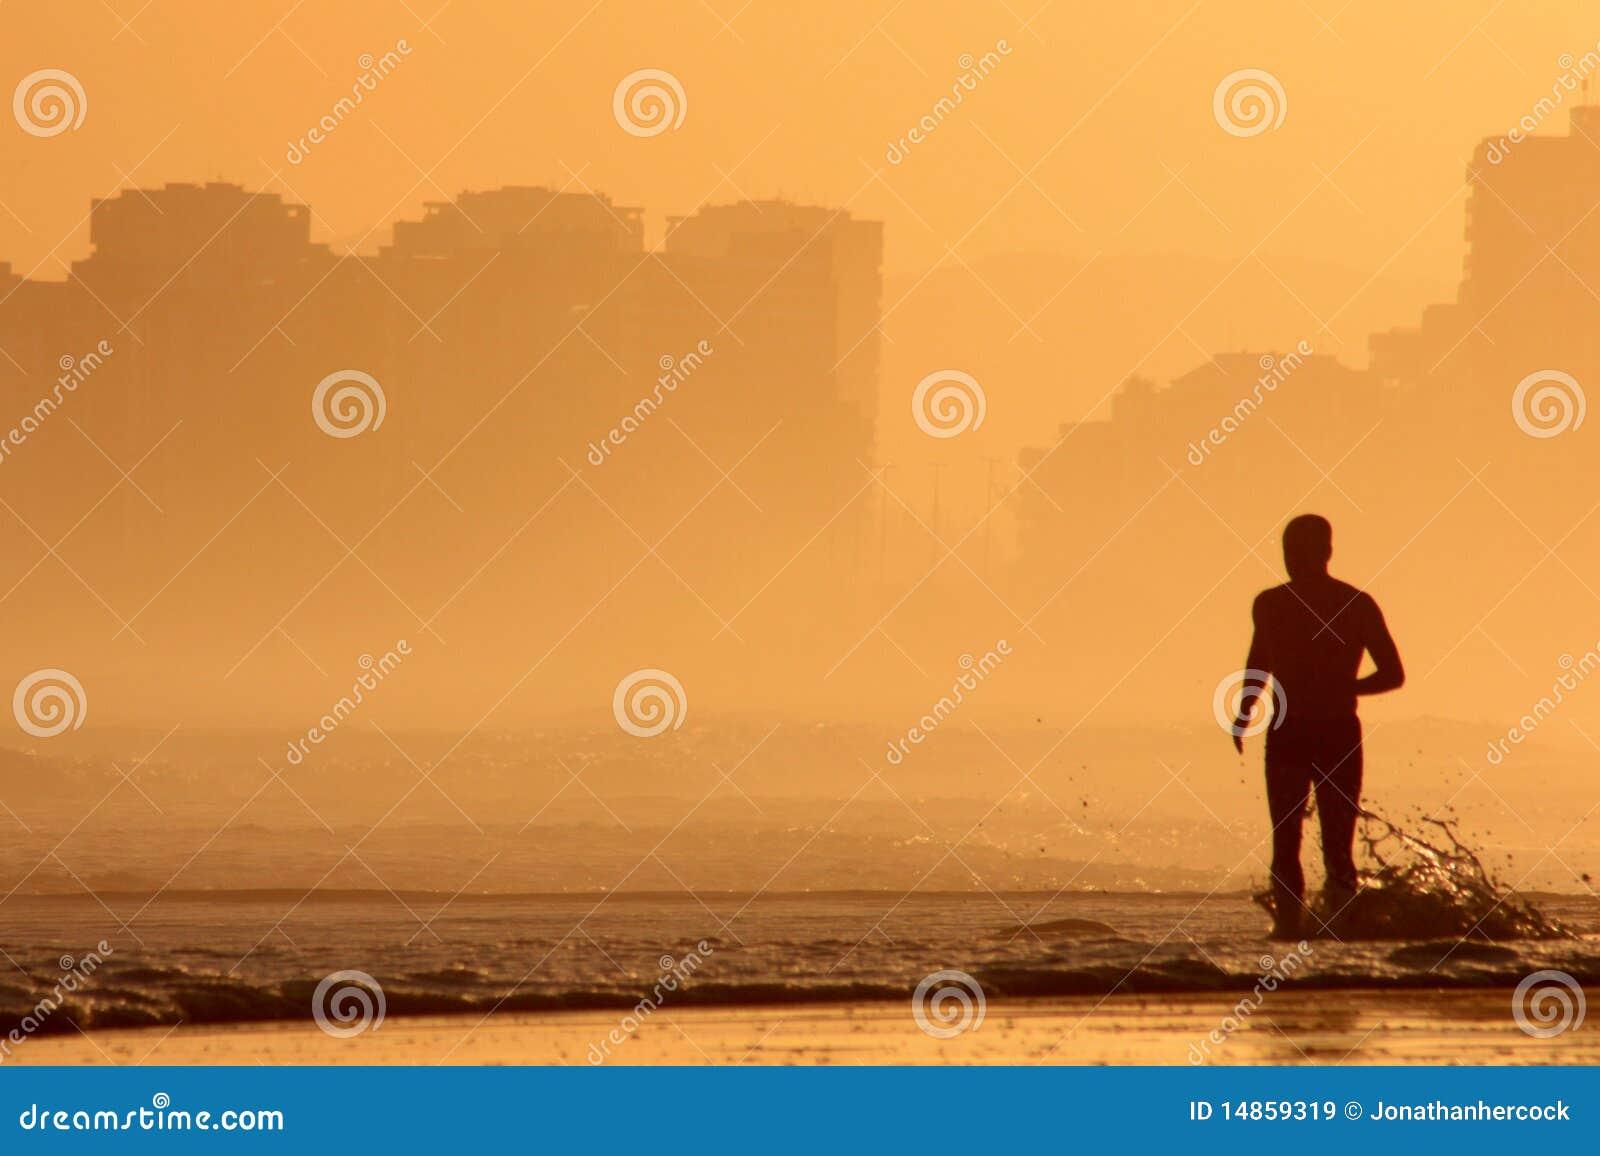 Golden running